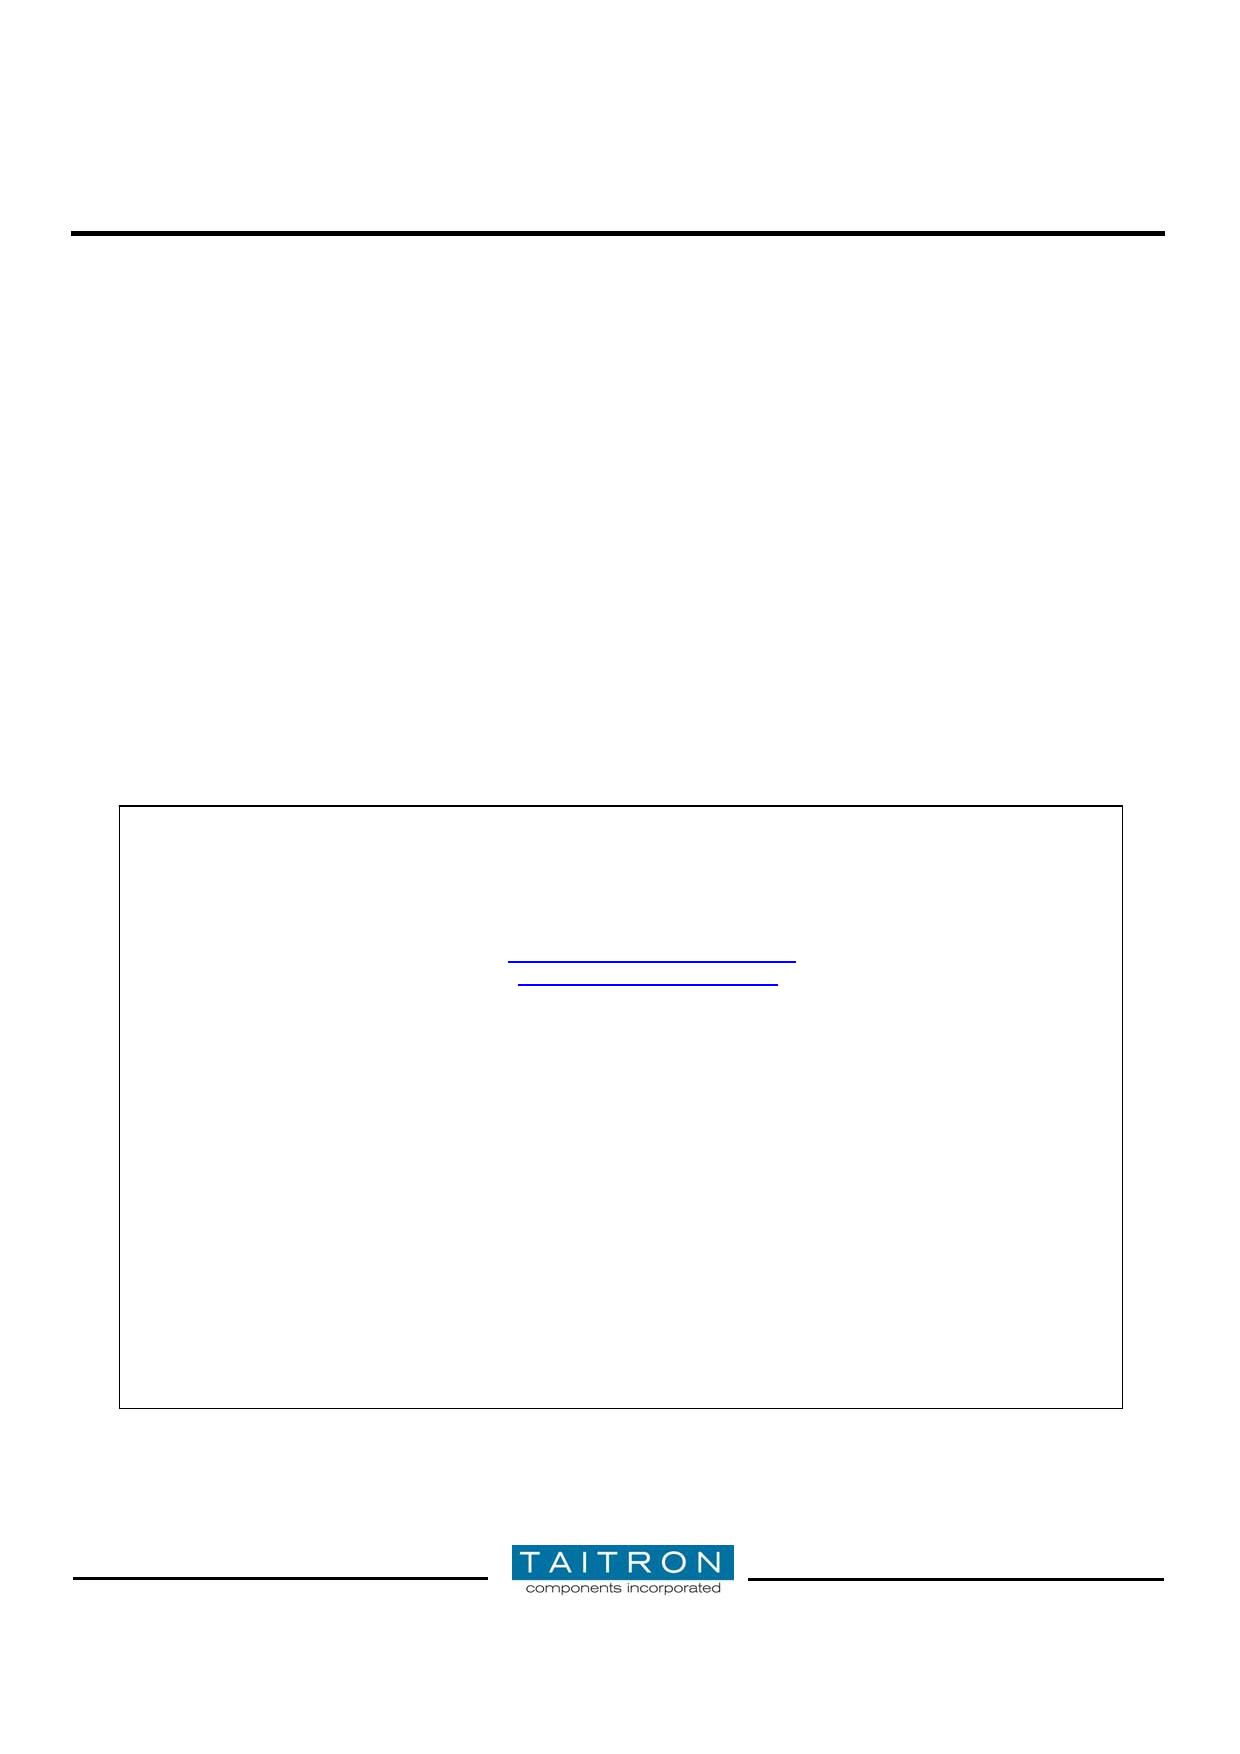 MR852 pdf, 반도체, 판매, 대치품